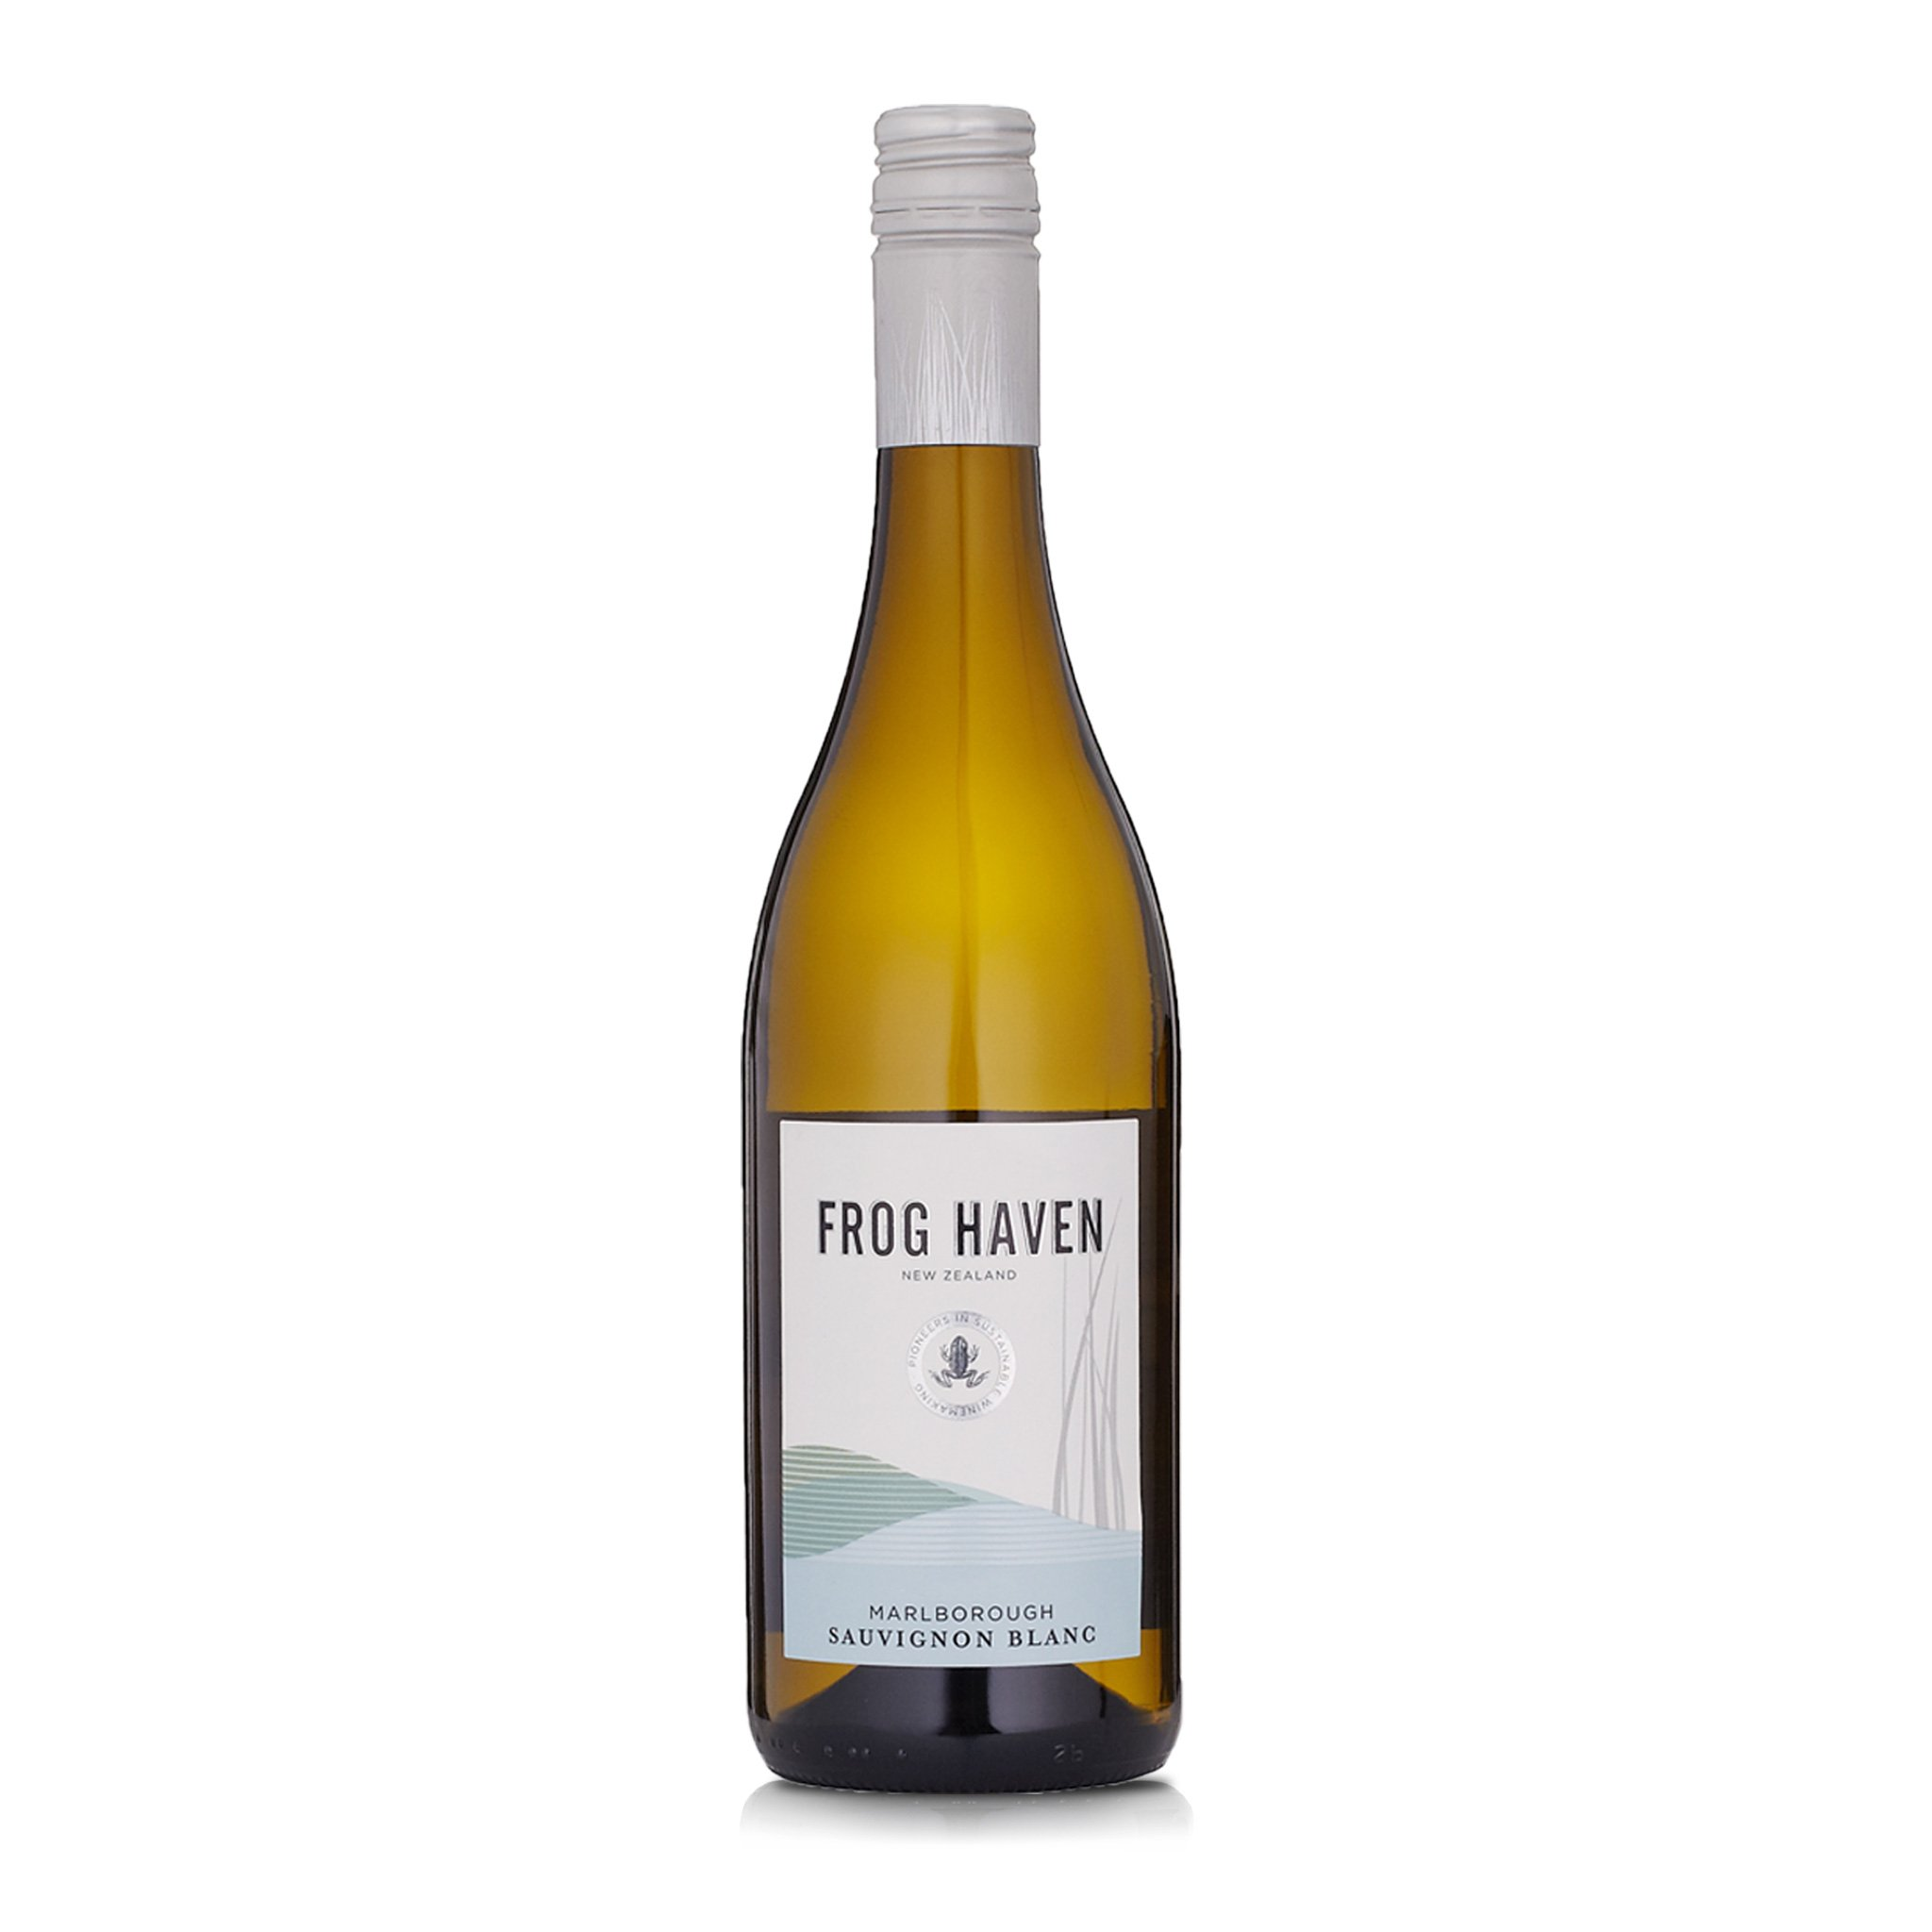 Frog Haven Sauvignon Blanc 2016 12 bottles